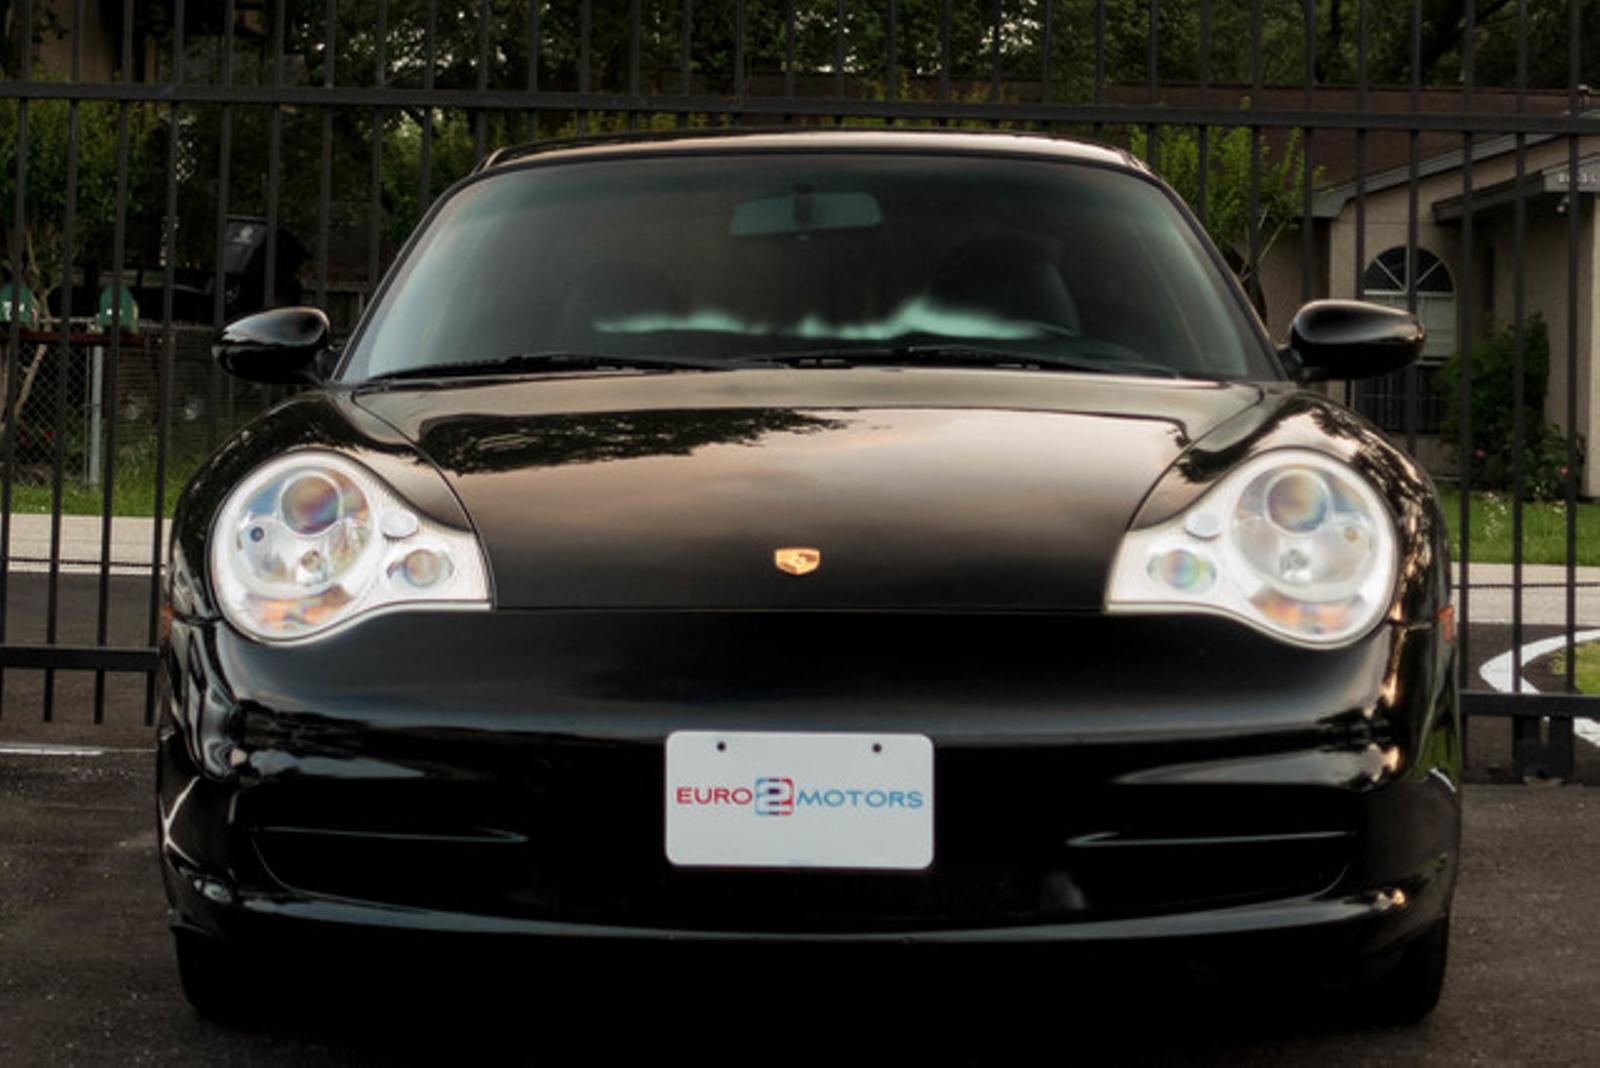 2002 Porsche 911 Carrera Texas Euro 2 Motors